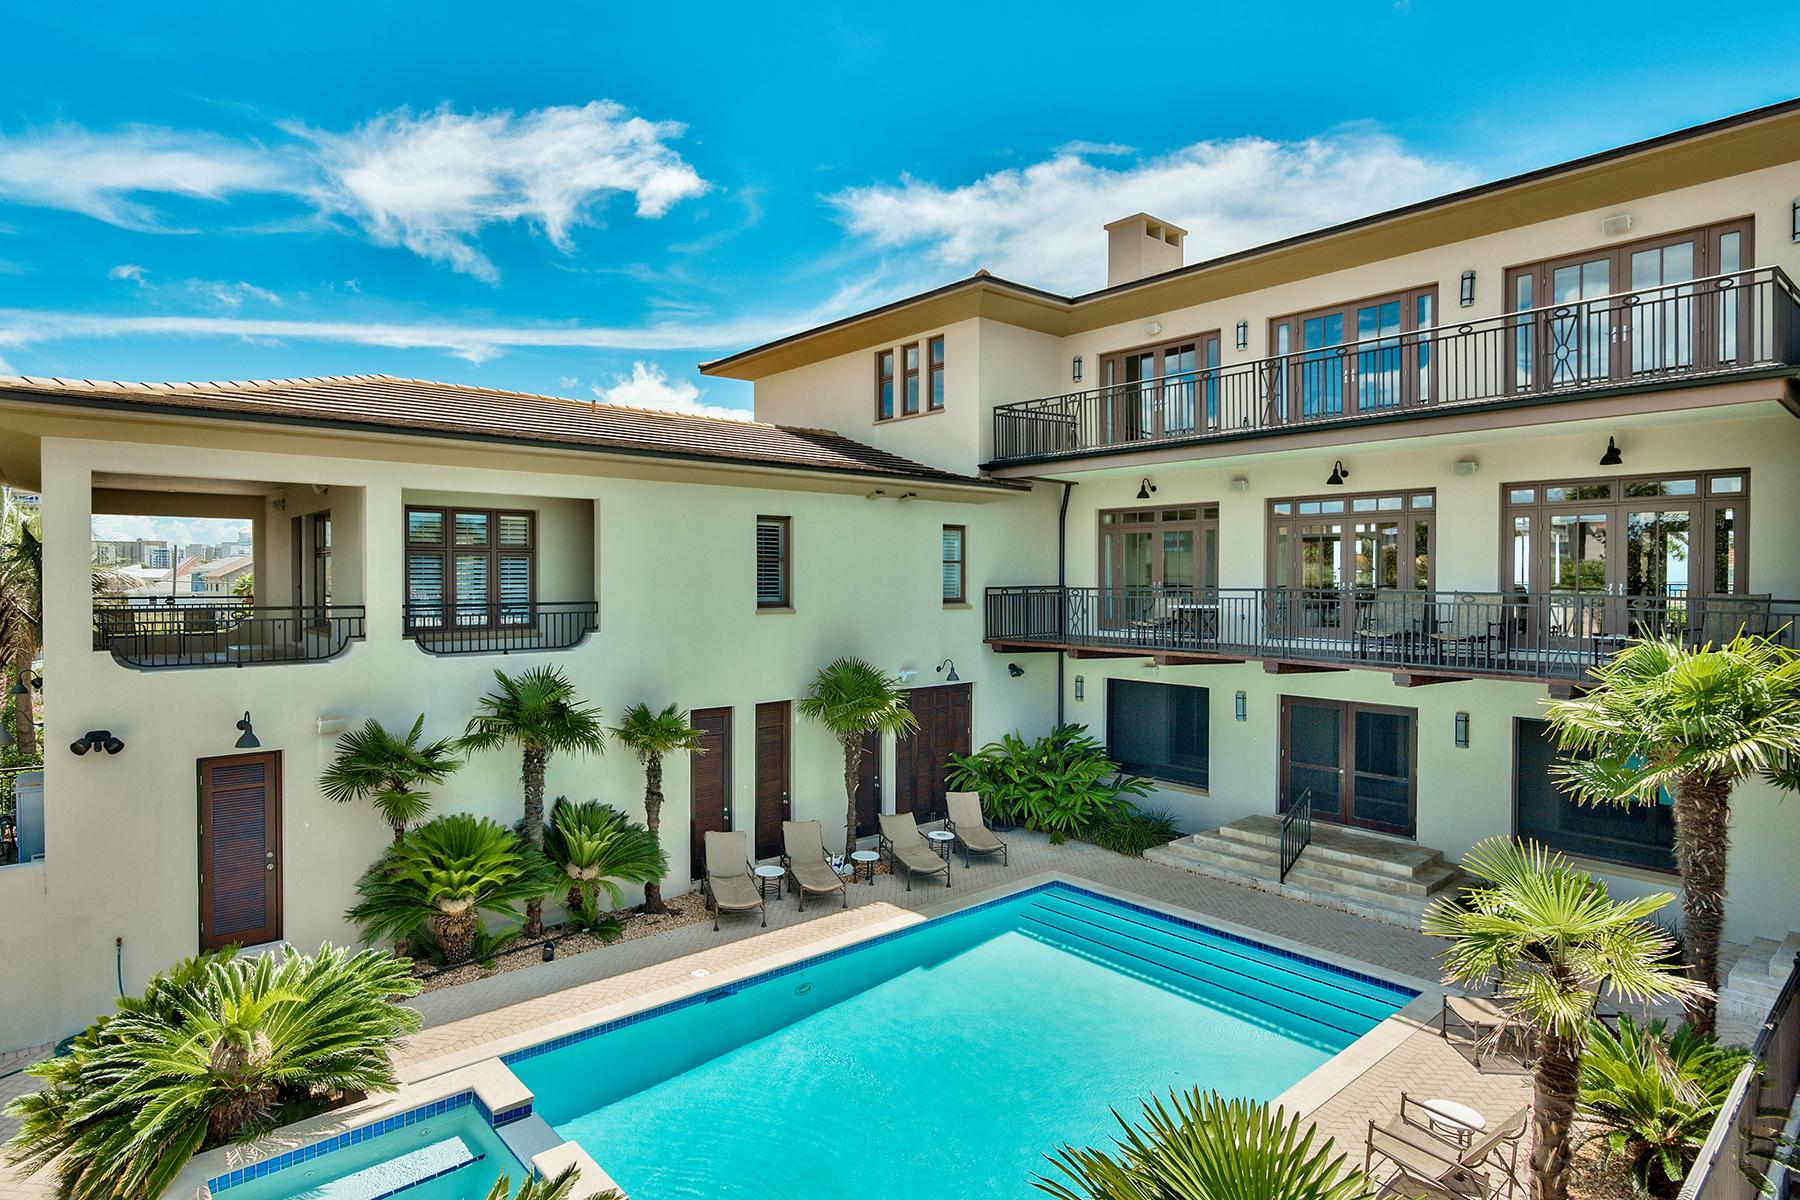 獨棟家庭住宅 為 出售 在 CANAL FRONT HOLIDAY ISLE RETREAT 627 Gulf Shore Drive Destin, 佛羅里達州, 32541 美國